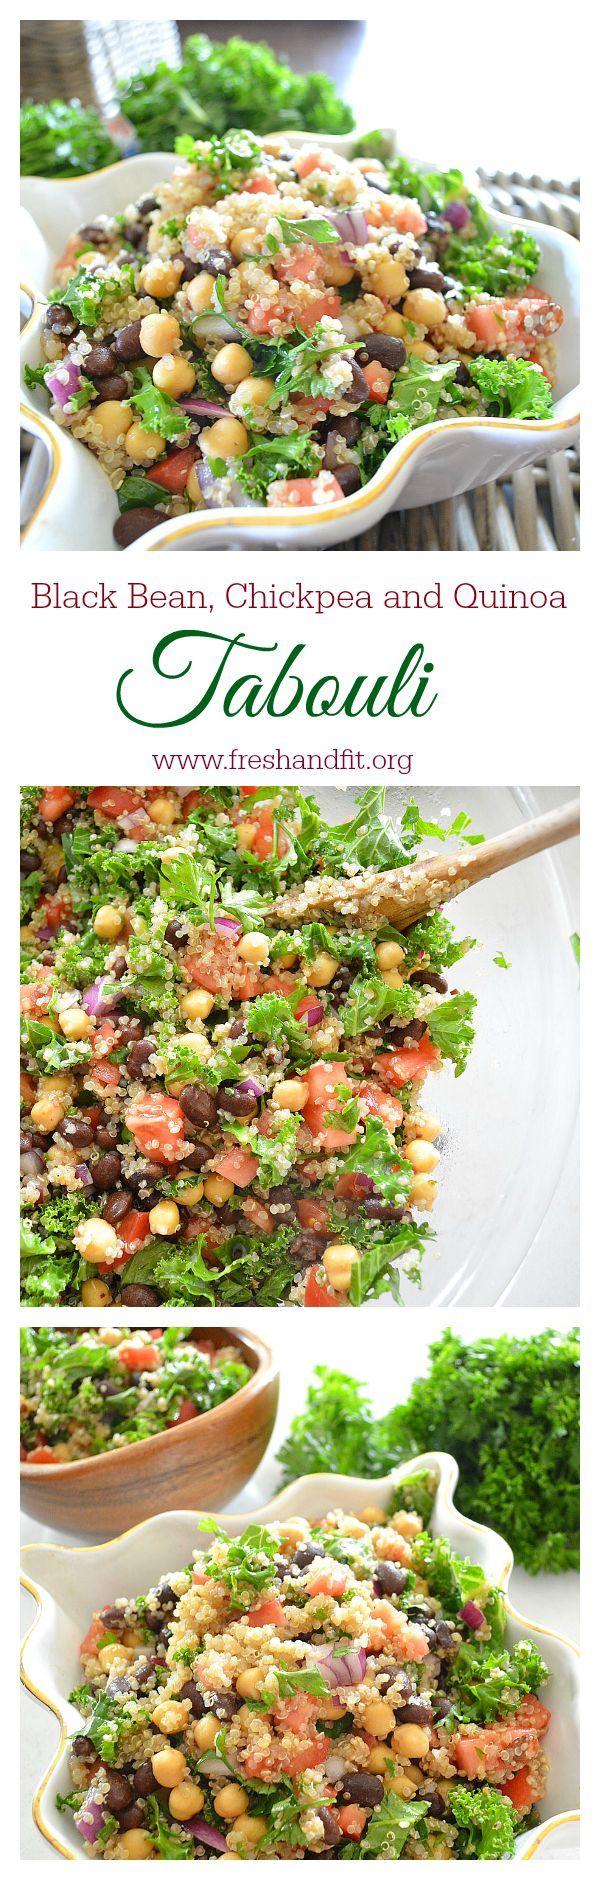 Black Bean, Quinoa and Chickpea Tabouli